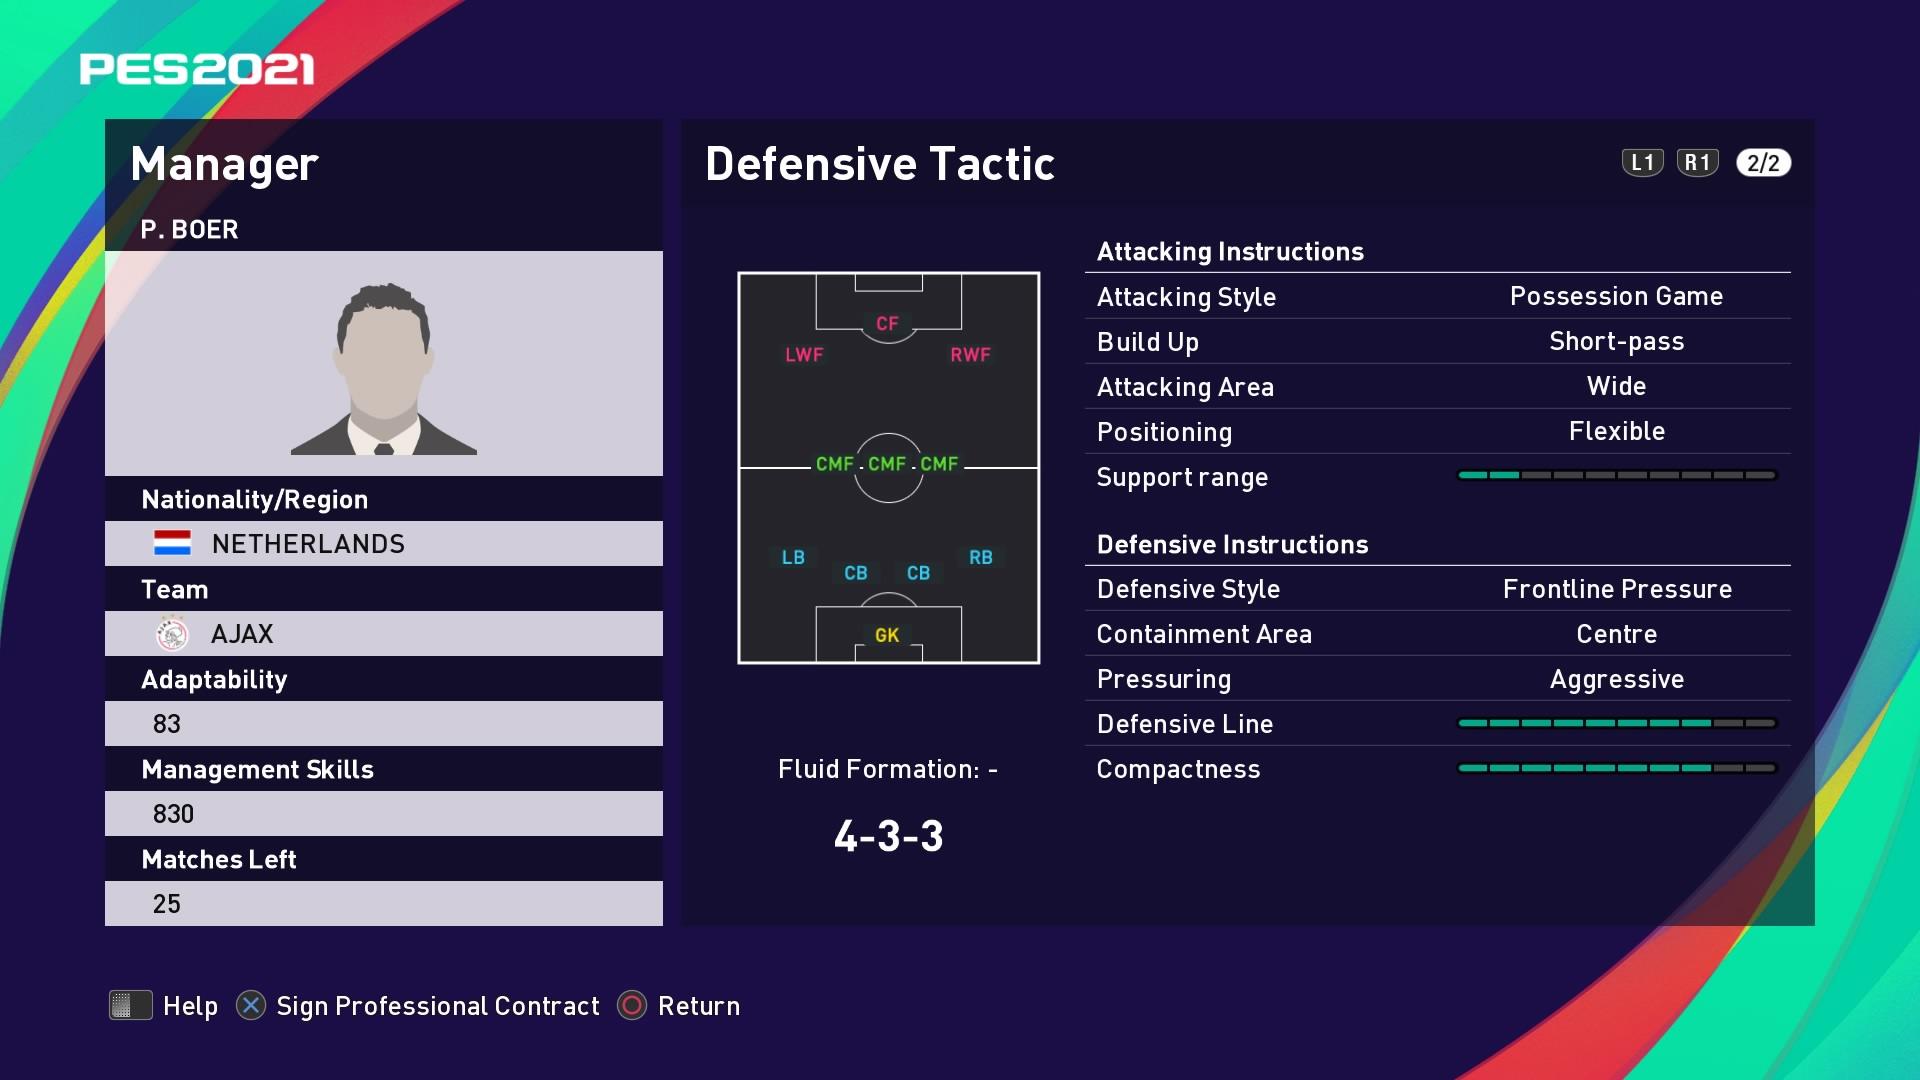 P. Boer (2) (Erik ten Hag) Defensive Tactic in PES 2021 myClub